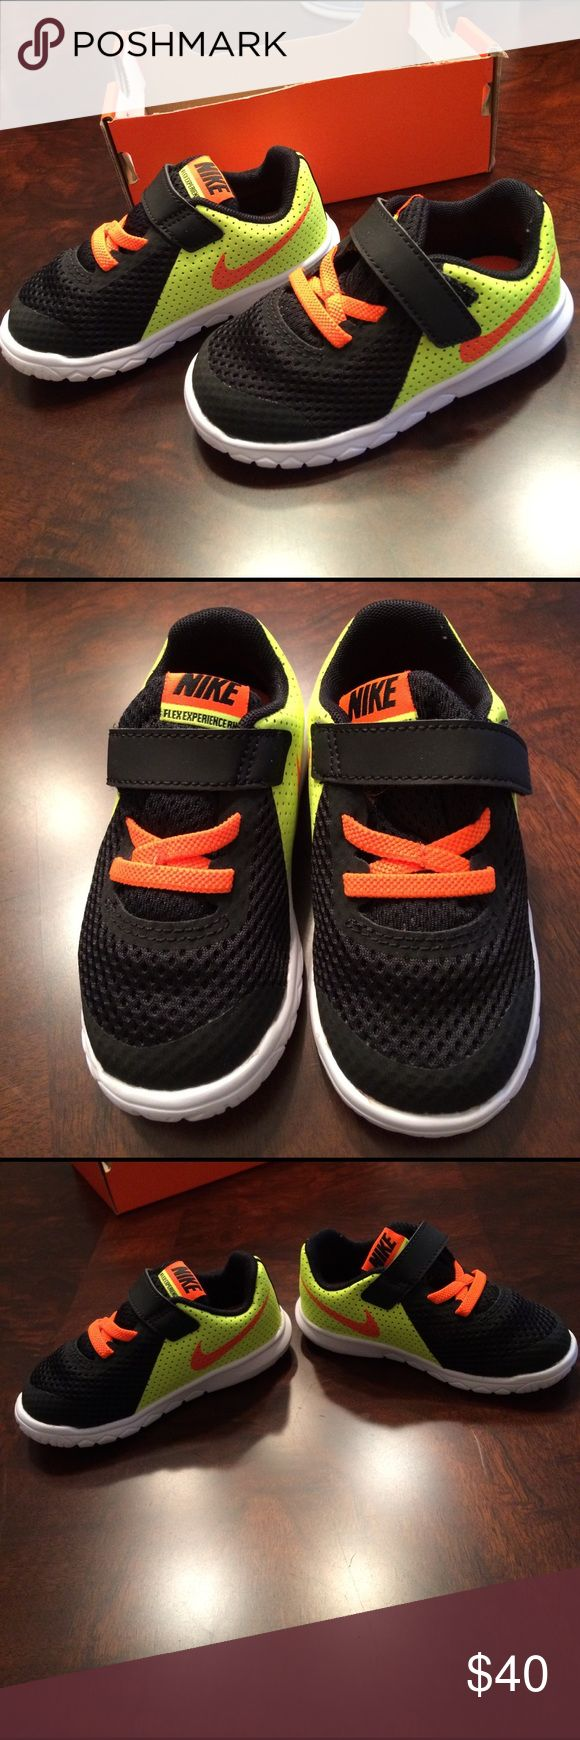 NIB! Baby boys Nike shoes, 7. NIB neon yellow, neon orange and black, baby boys Nike shoes, so cute! Size, 7. Nike Shoes Sneakers